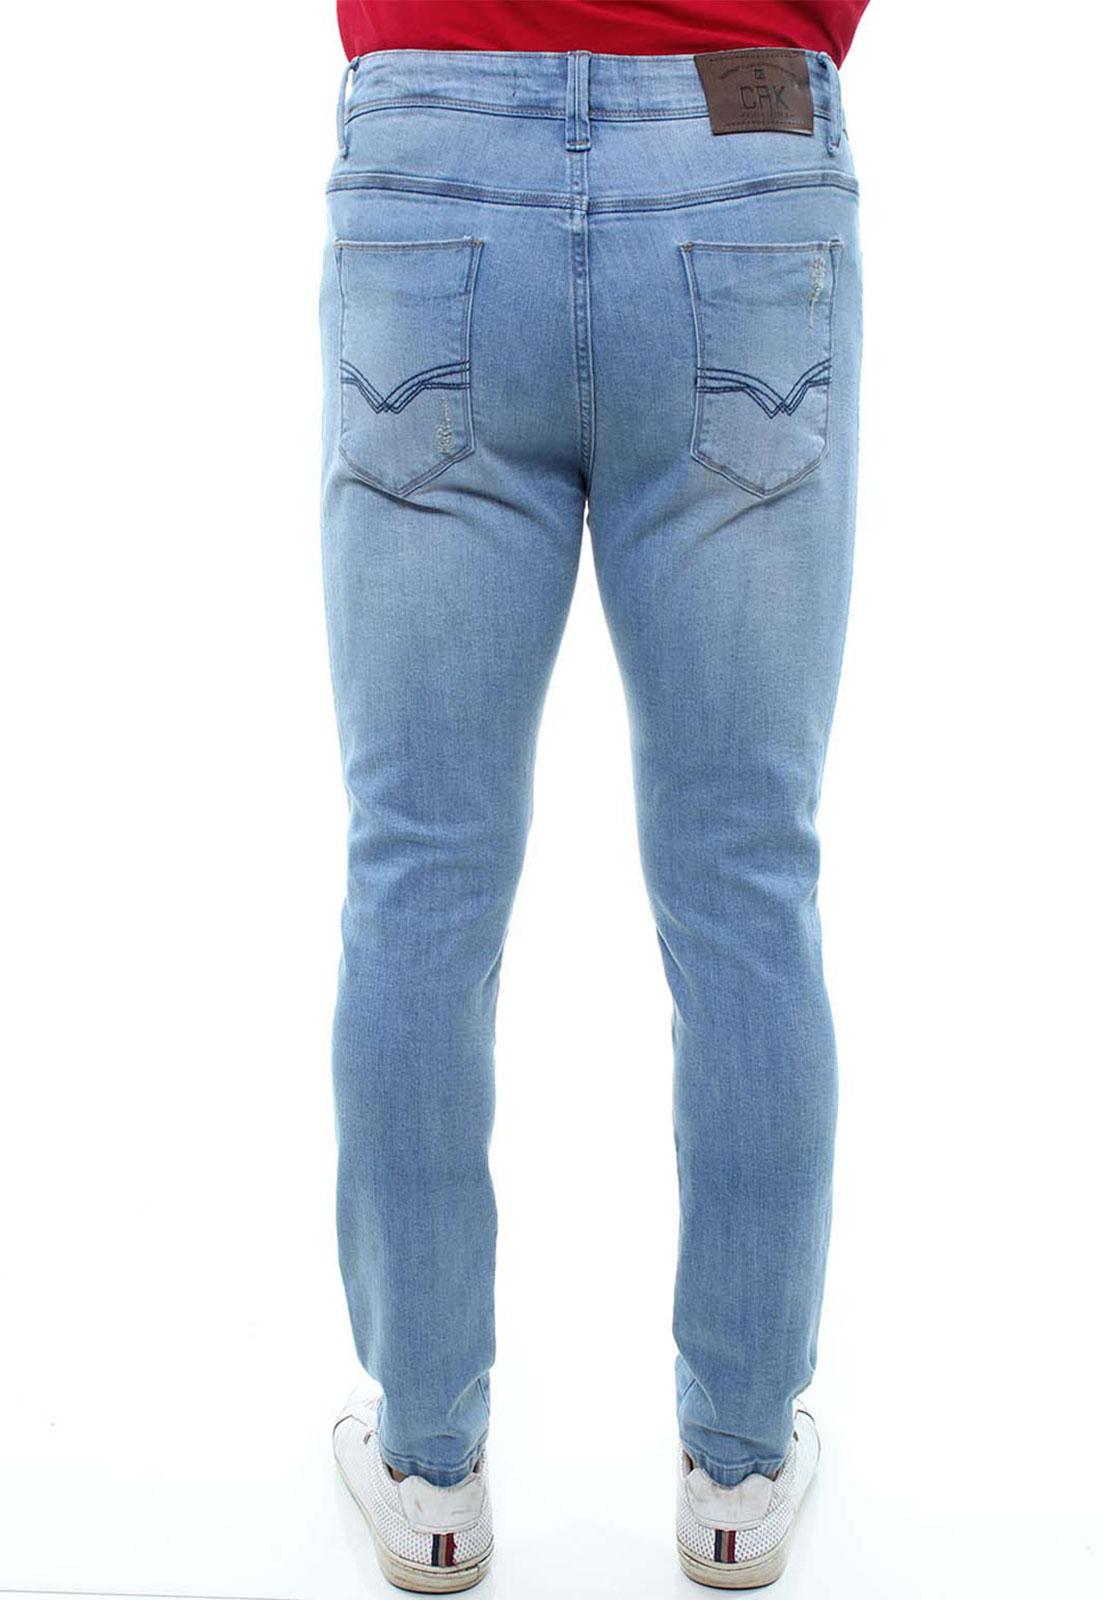 Calça Confort Jeans Masculina Crocker - 47790  - CROCKER JEANS